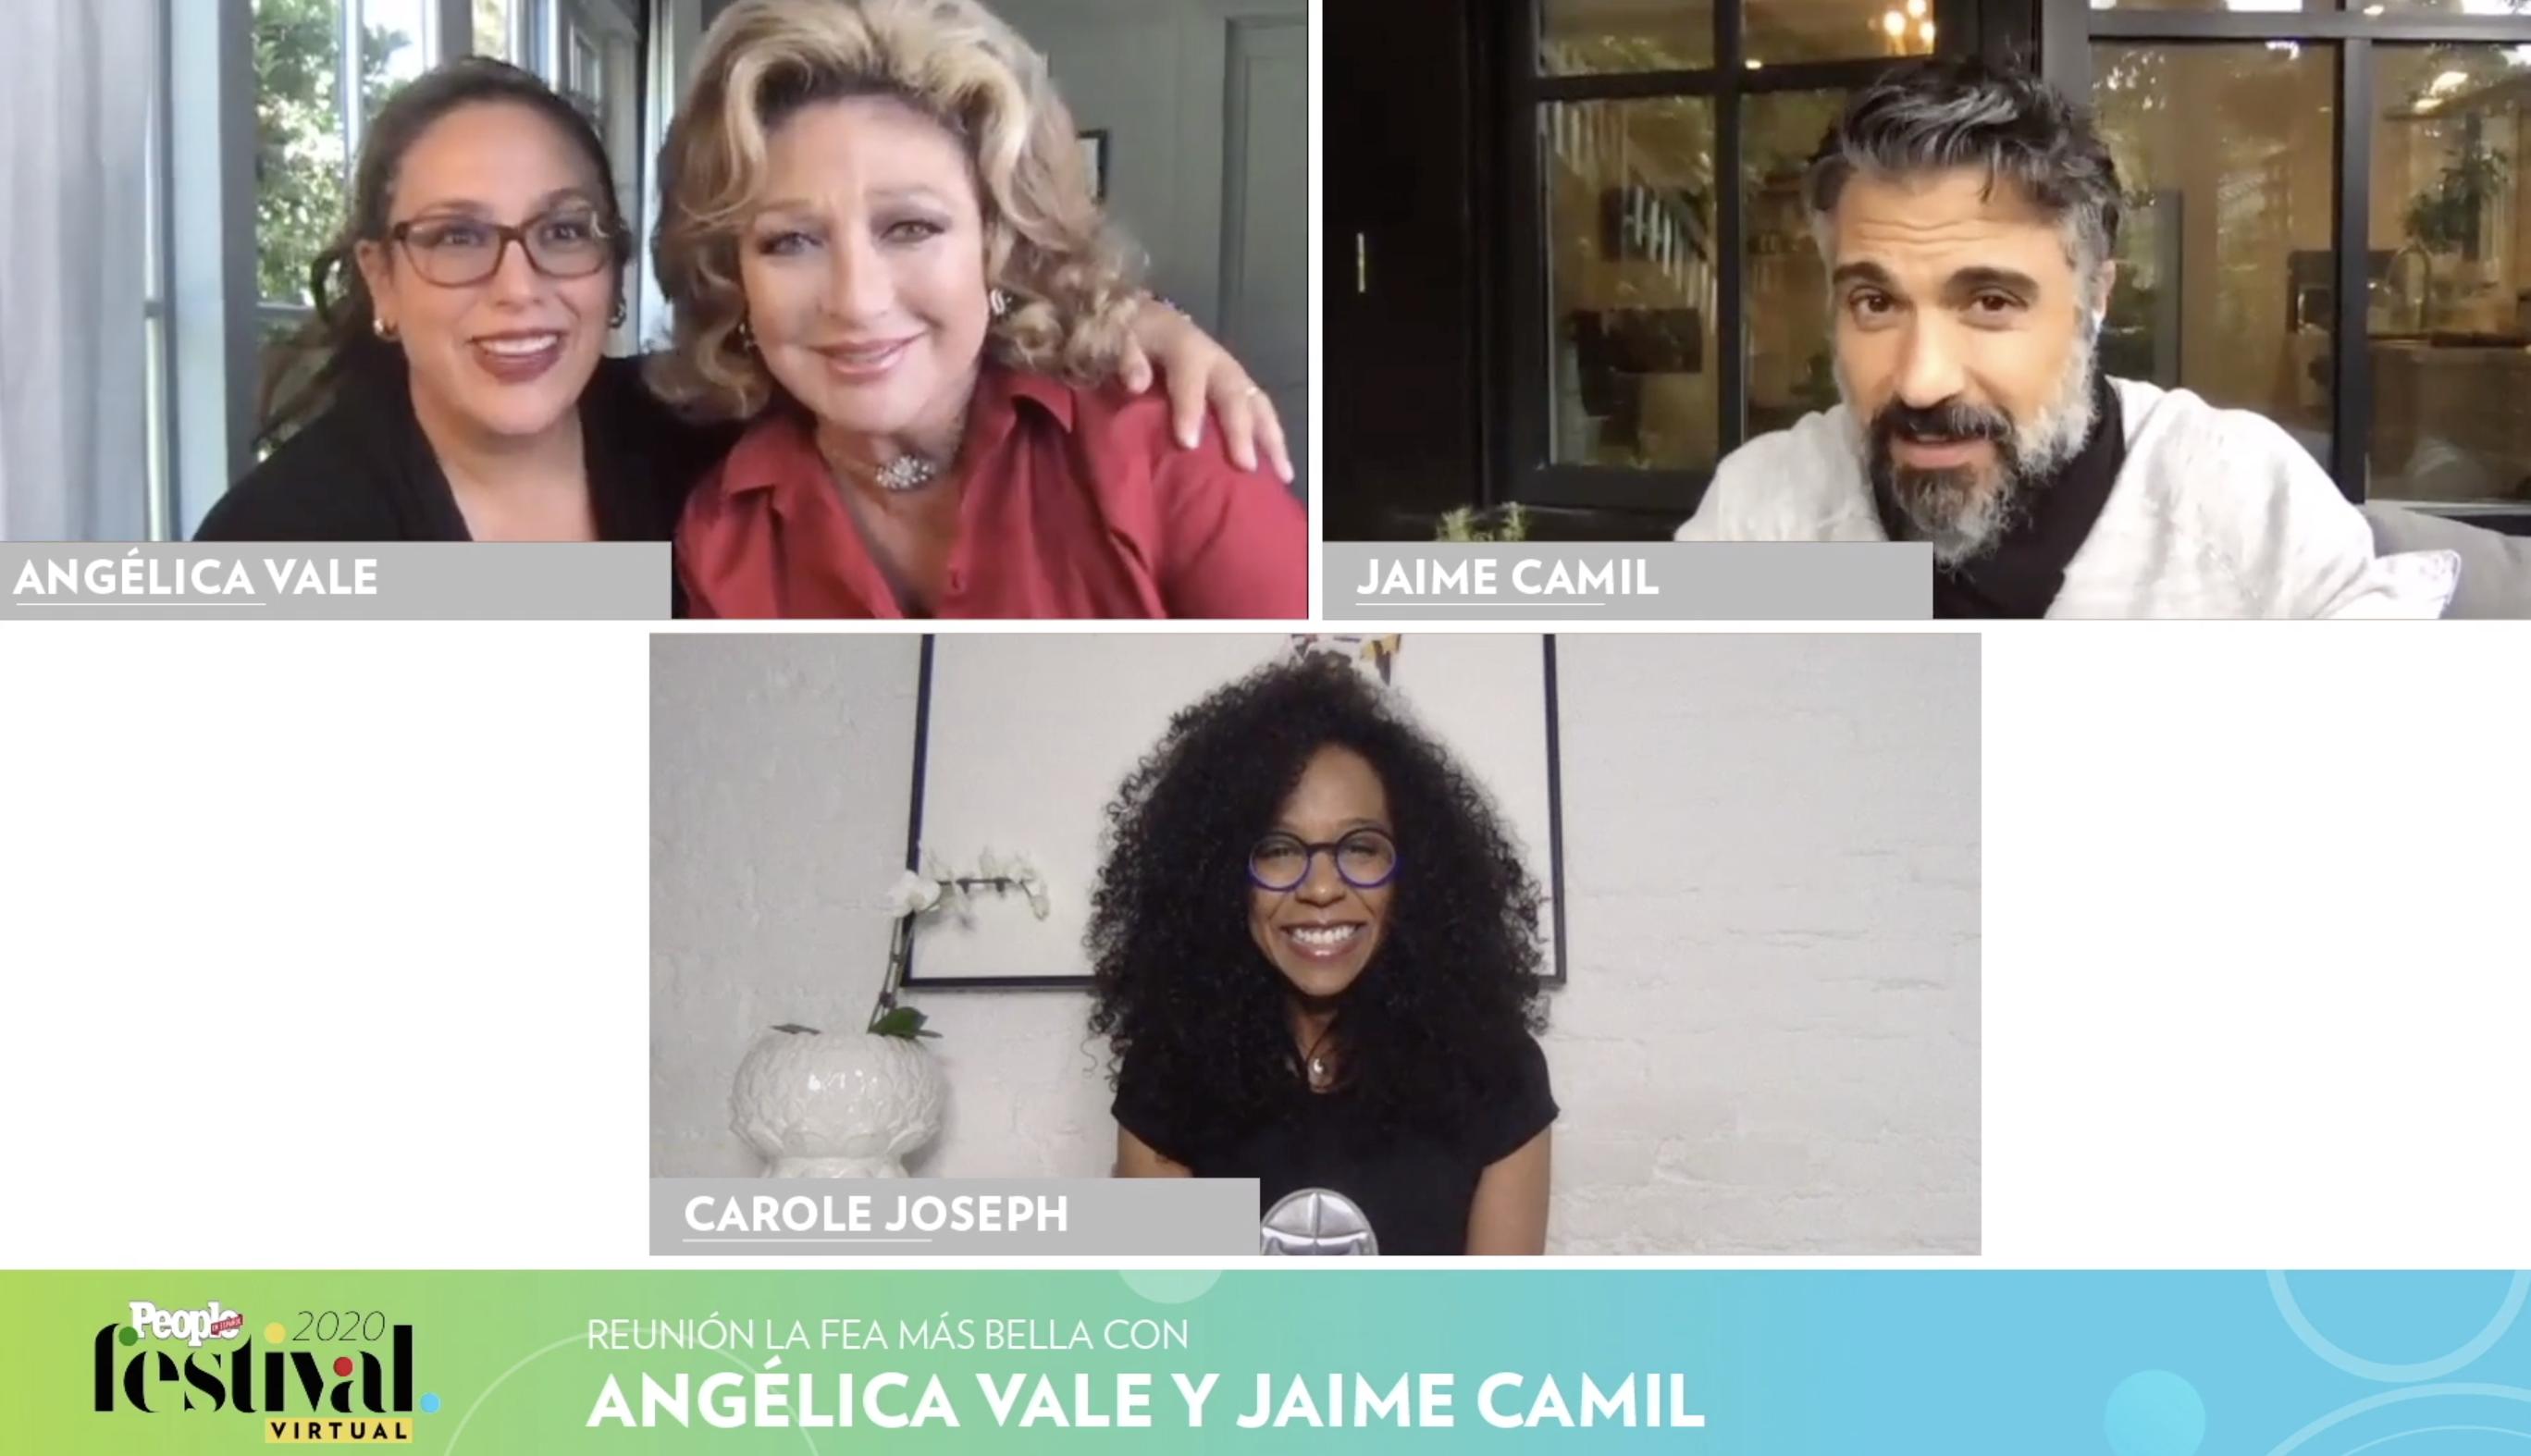 Angélica Vale, Angélica María Jaime Camil y Carole Joseph